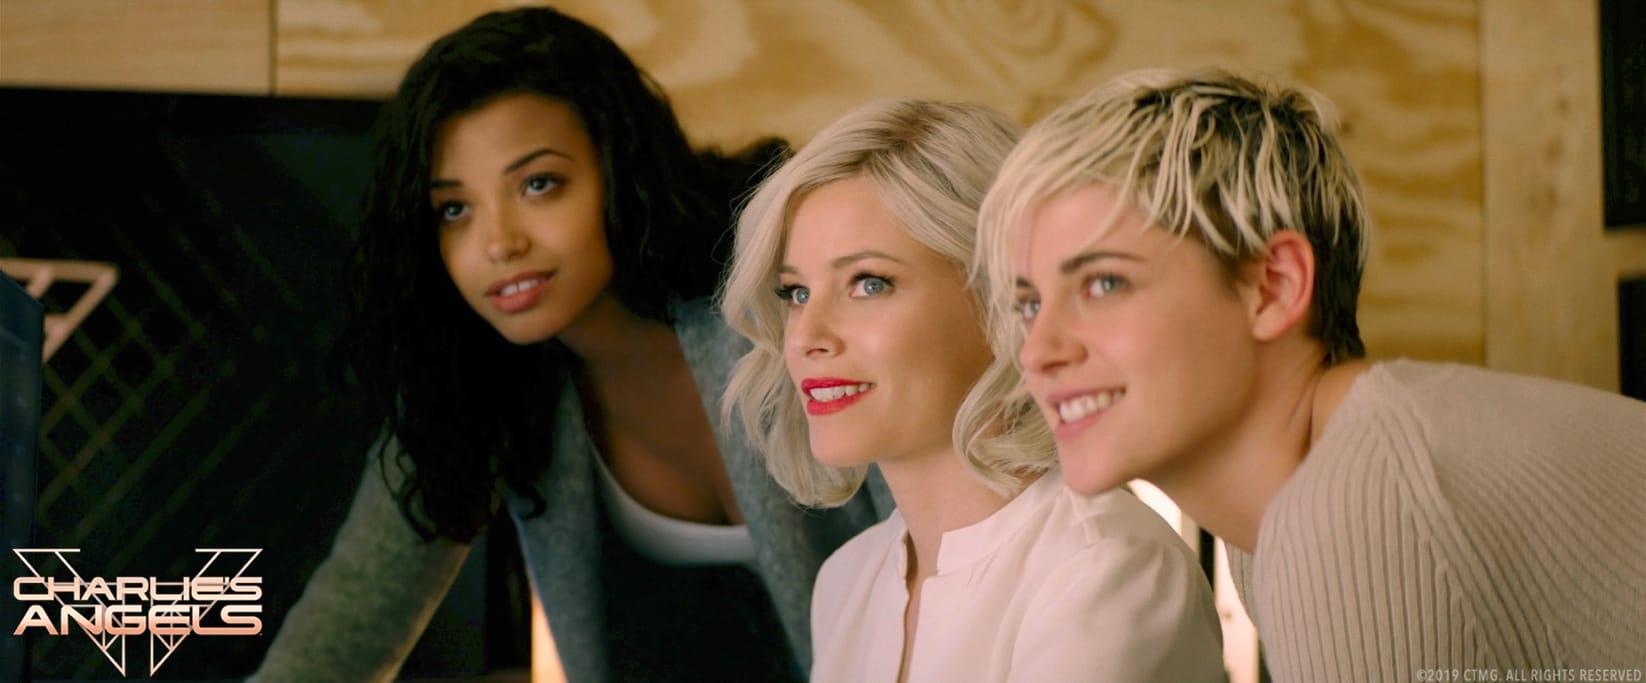 Ella Balinska, Elizabeth Banks and Kristen Stewart star in Charlie's Angels.